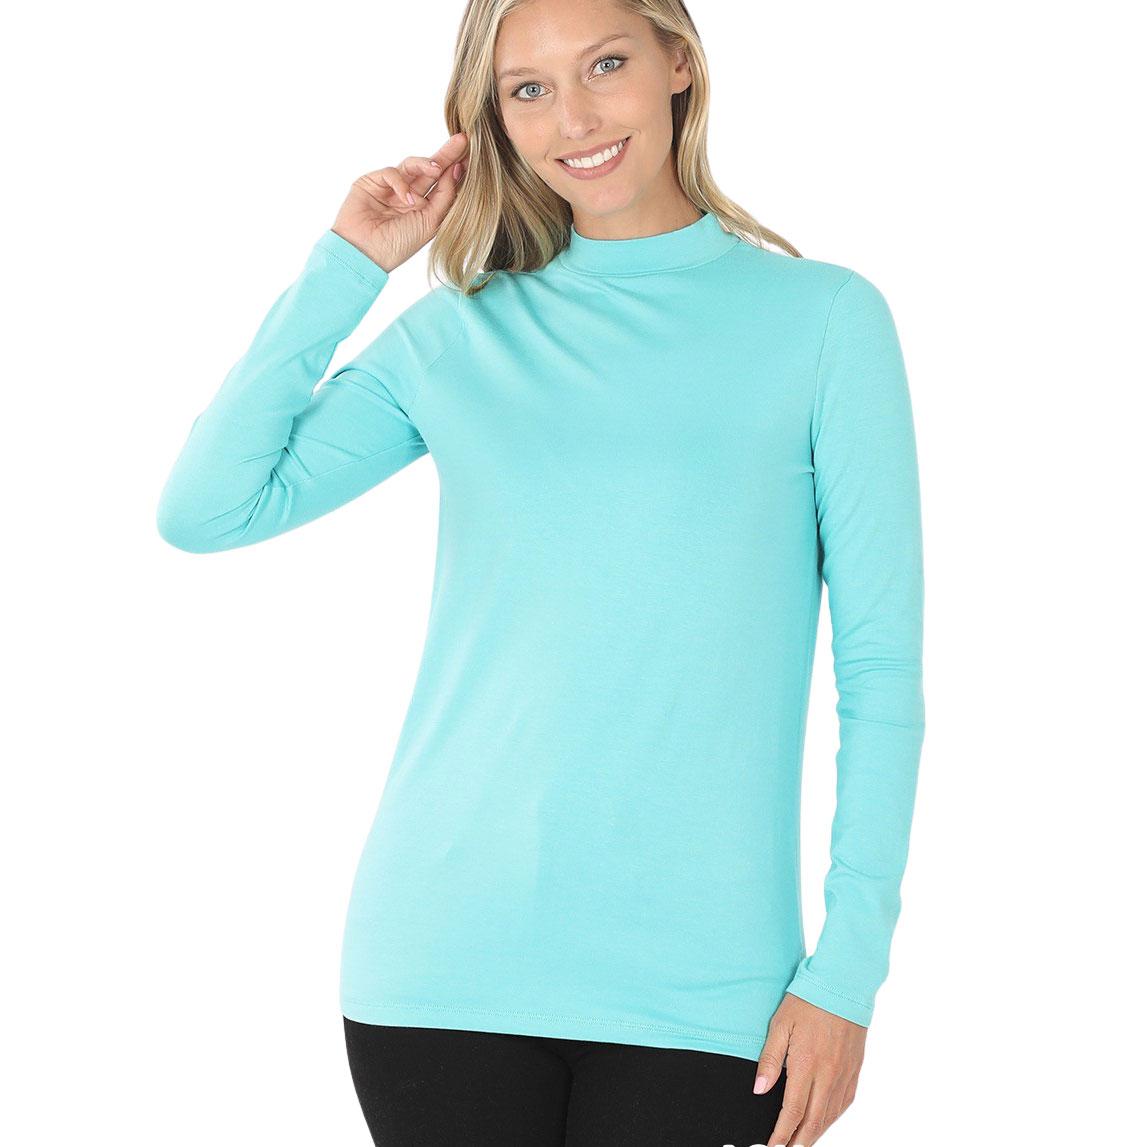 Mock Turtleneck - Cotton Long Sleeve 1059 - ASH MINT Mock Turtleneck - Cotton Long Sleeve 1059